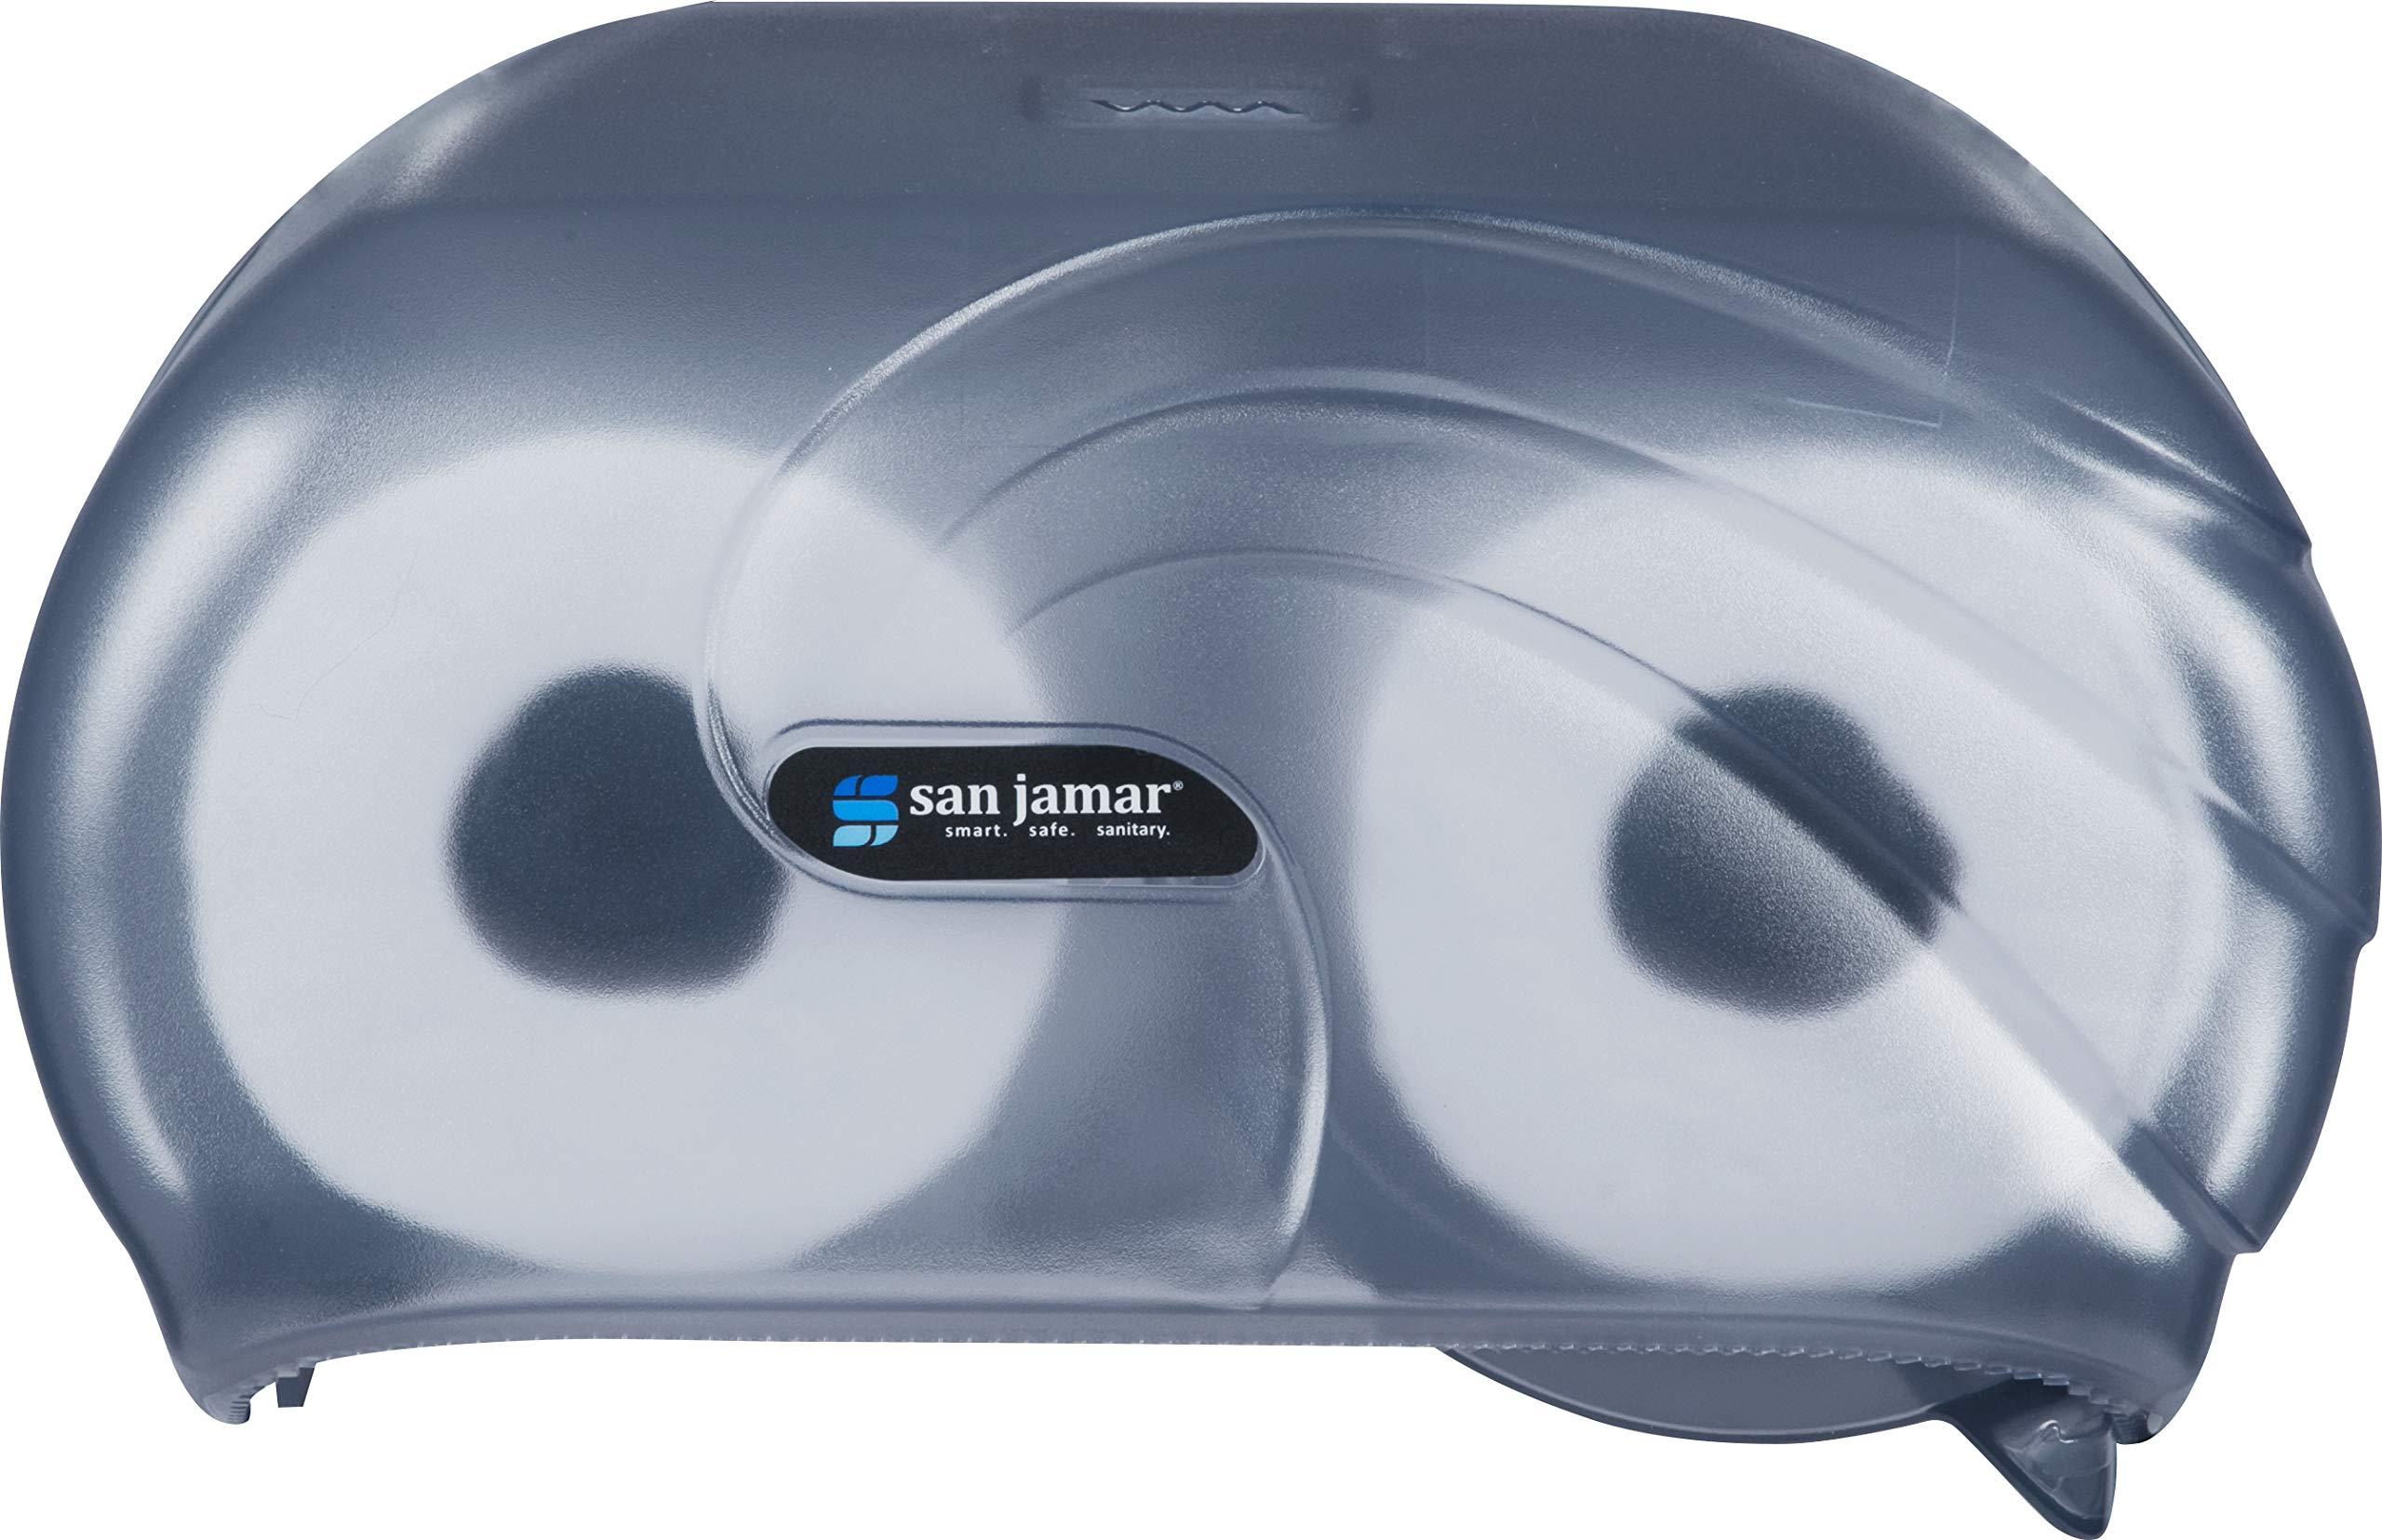 San Jamar R3690TBL Versatwin Double Roll Toilet Tissue Dispenser with Bio Pruf, Oceans, Arctic Blue